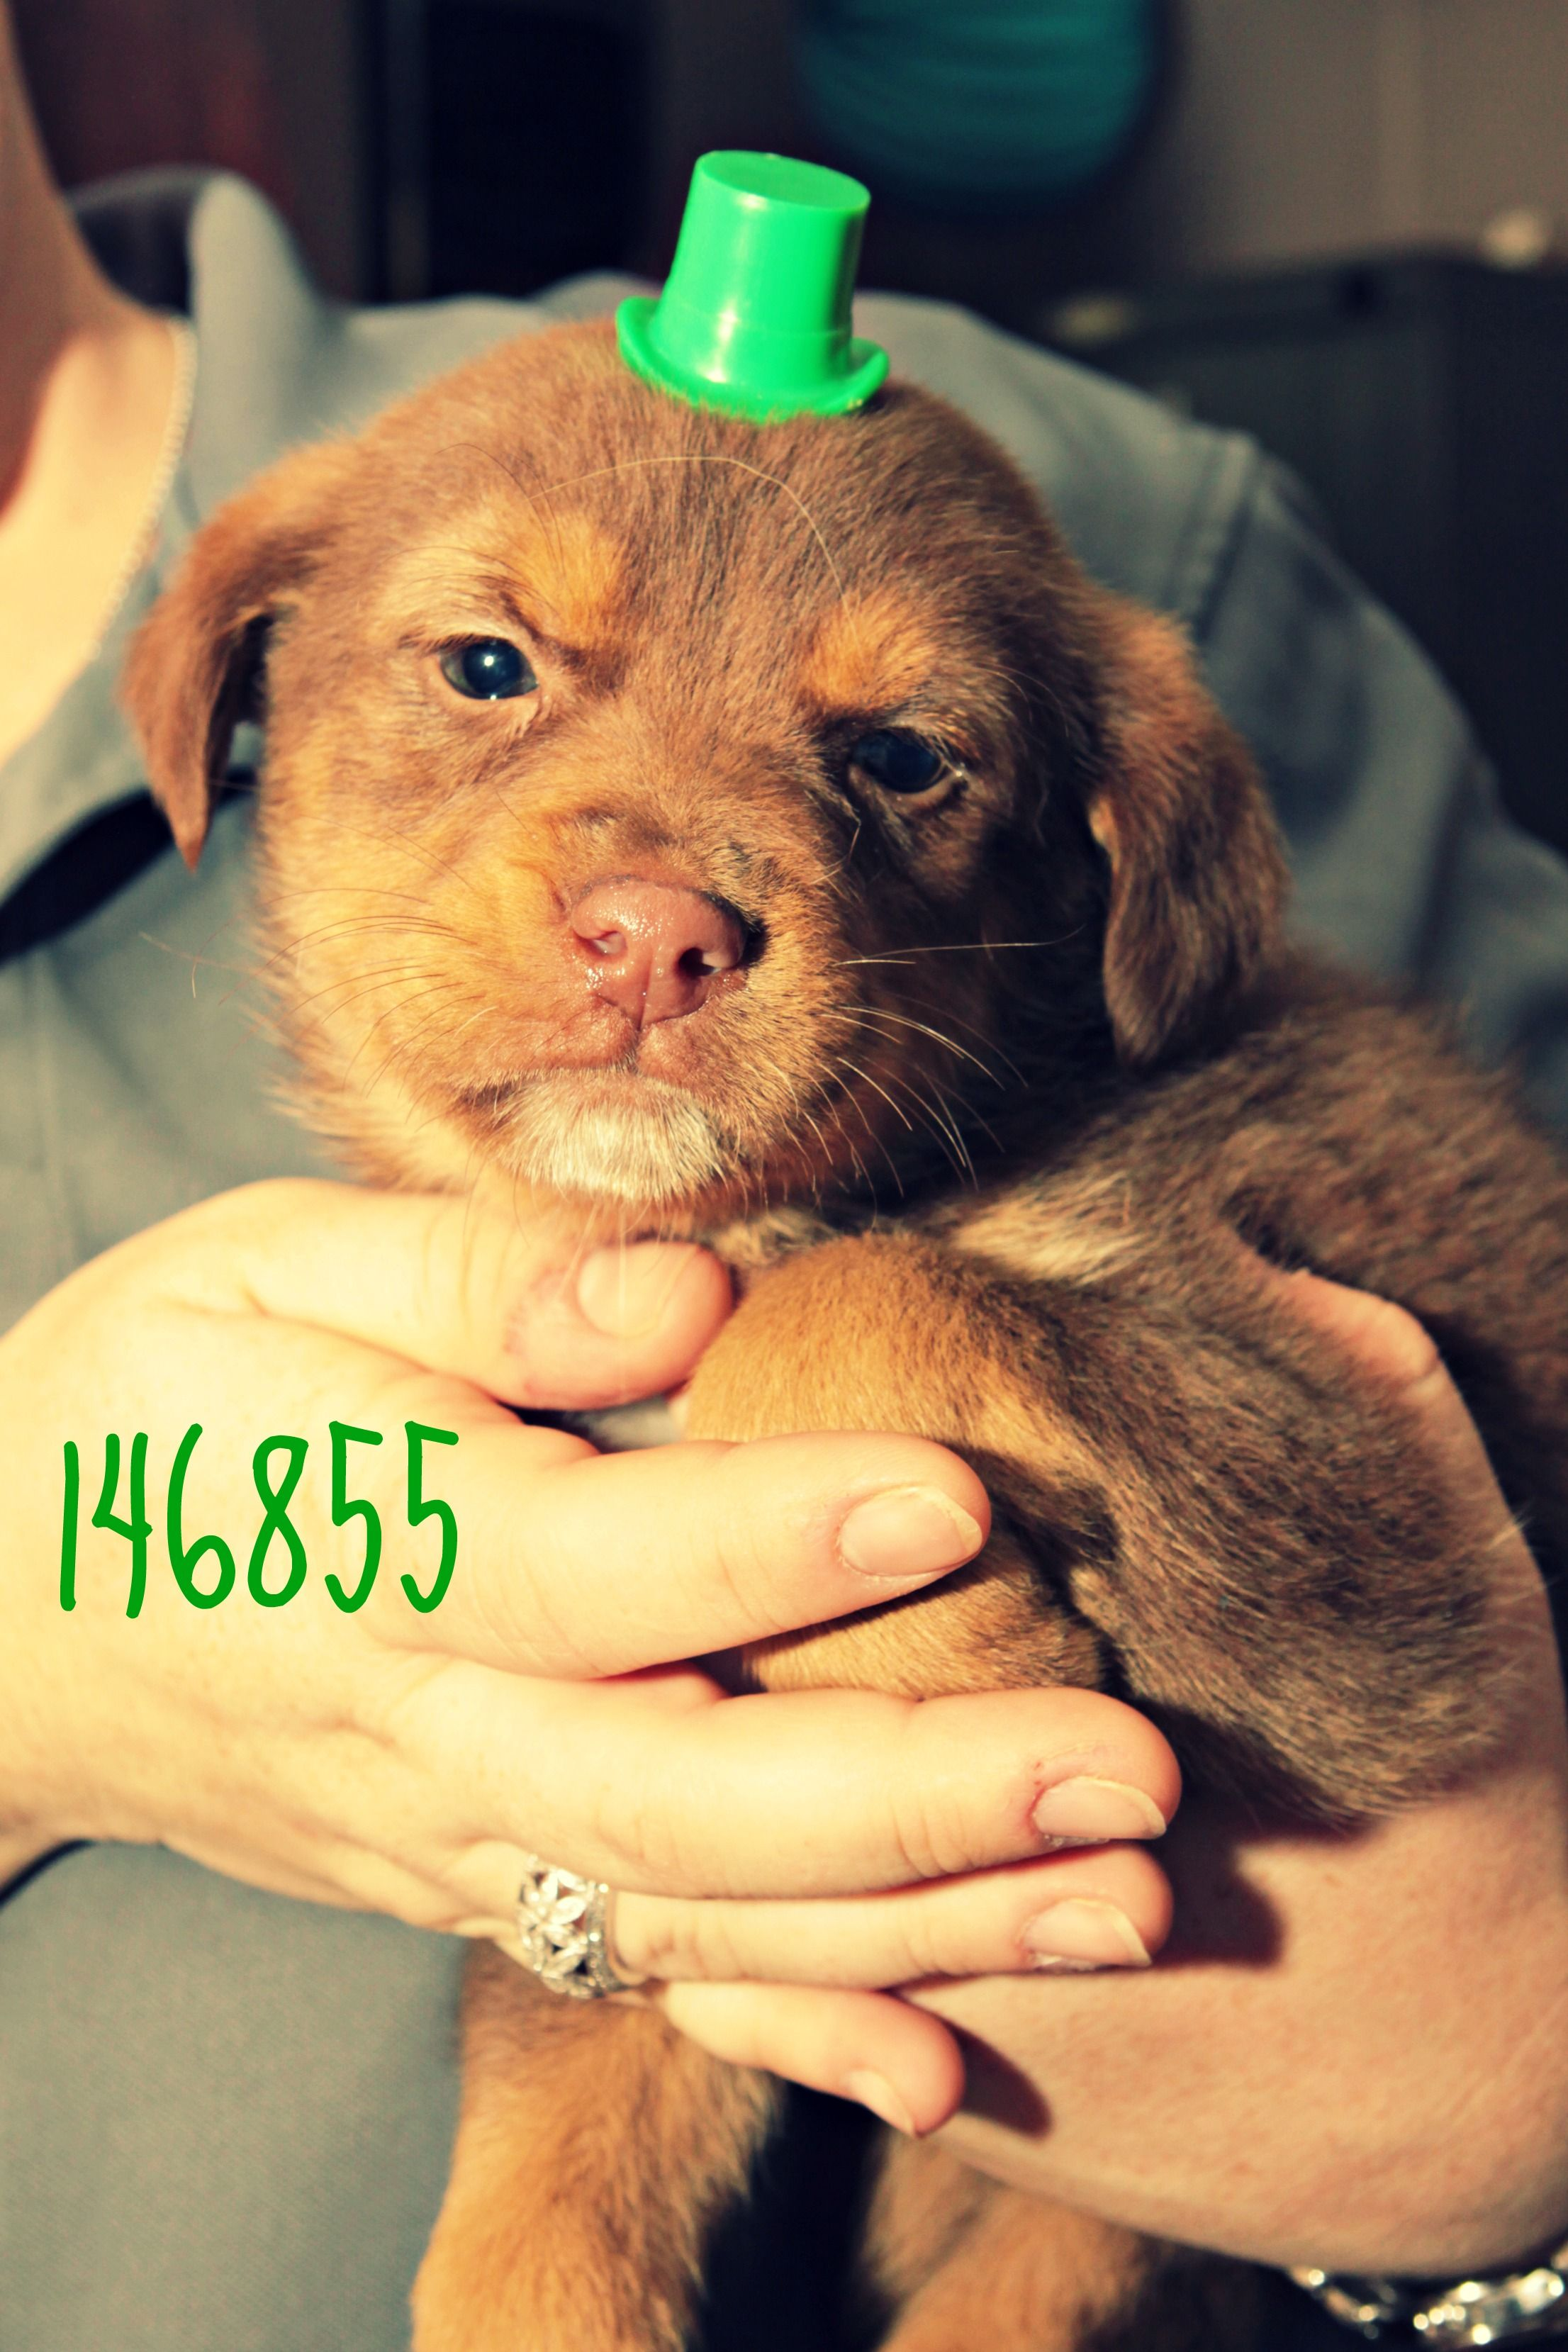 Teagan Adopt Me Today For More Information Please Visit Www Sandersvilleanimalshelter Com I Am Located In Sandersville Ga S Animal Shelter Animals Pets